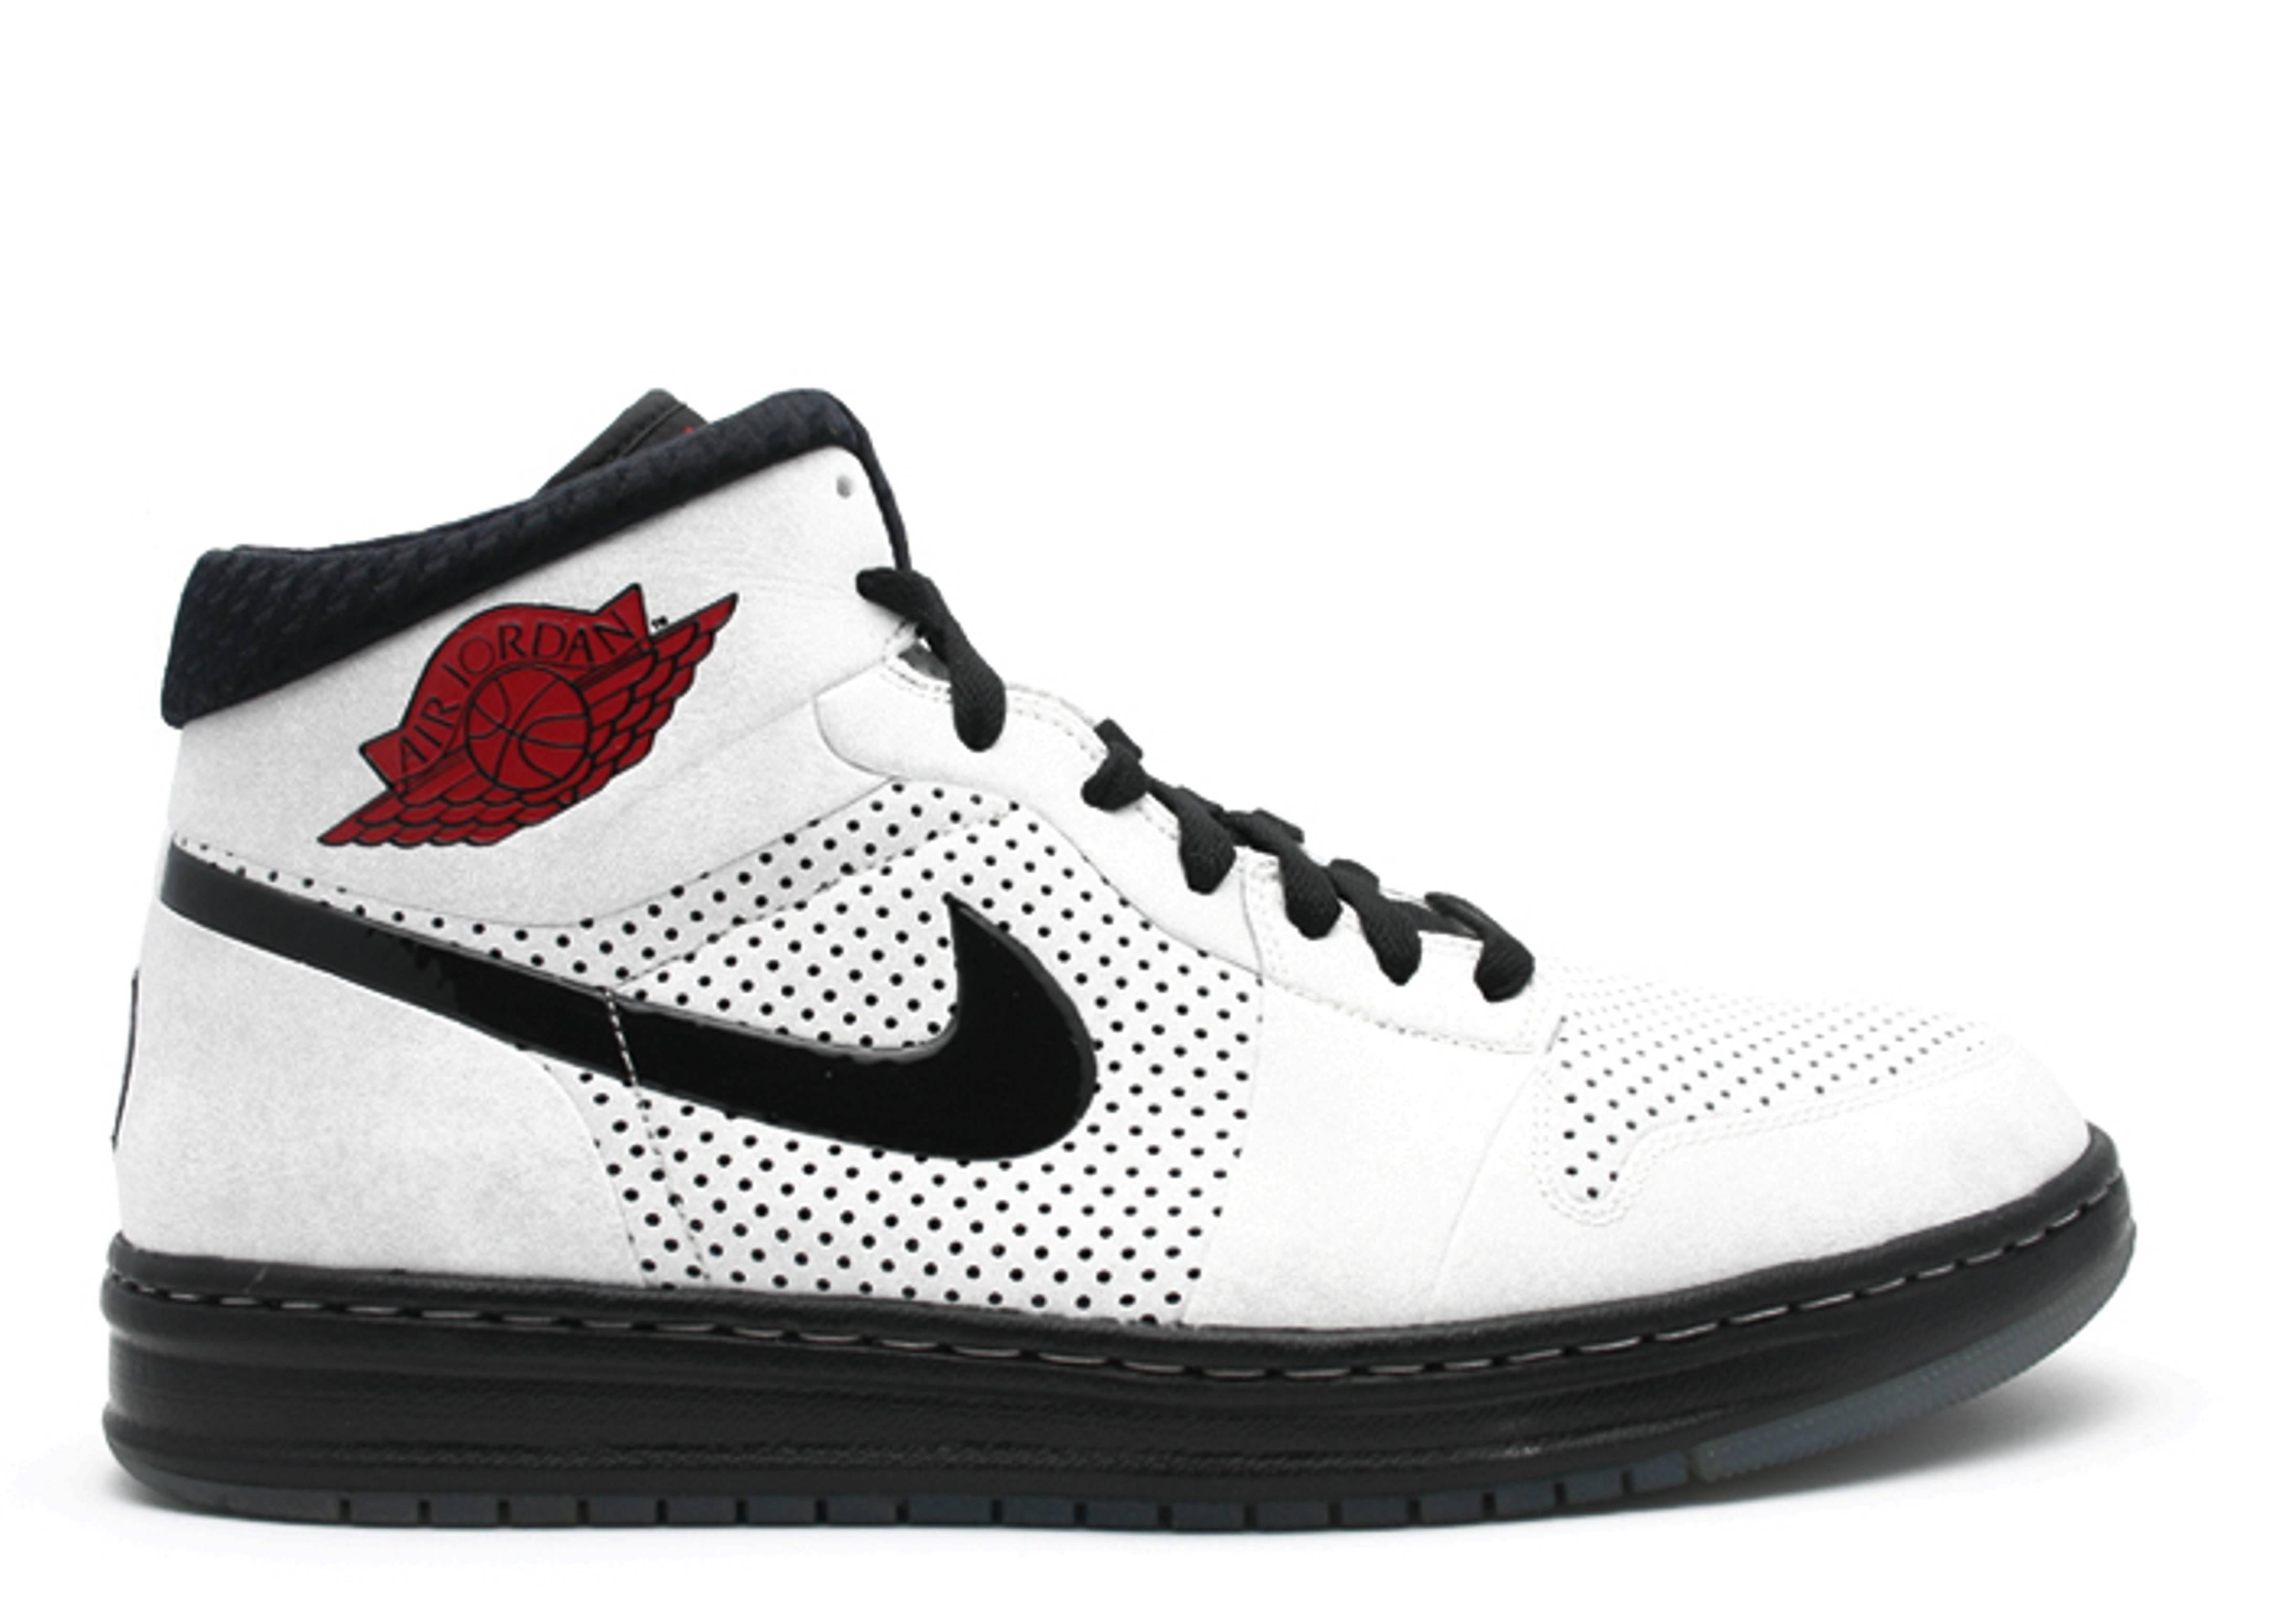 outlet store 314e7 7de6d Air Jordan Alpha 1 - Air Jordan - 392813 104 - white black varsity red    Flight Club